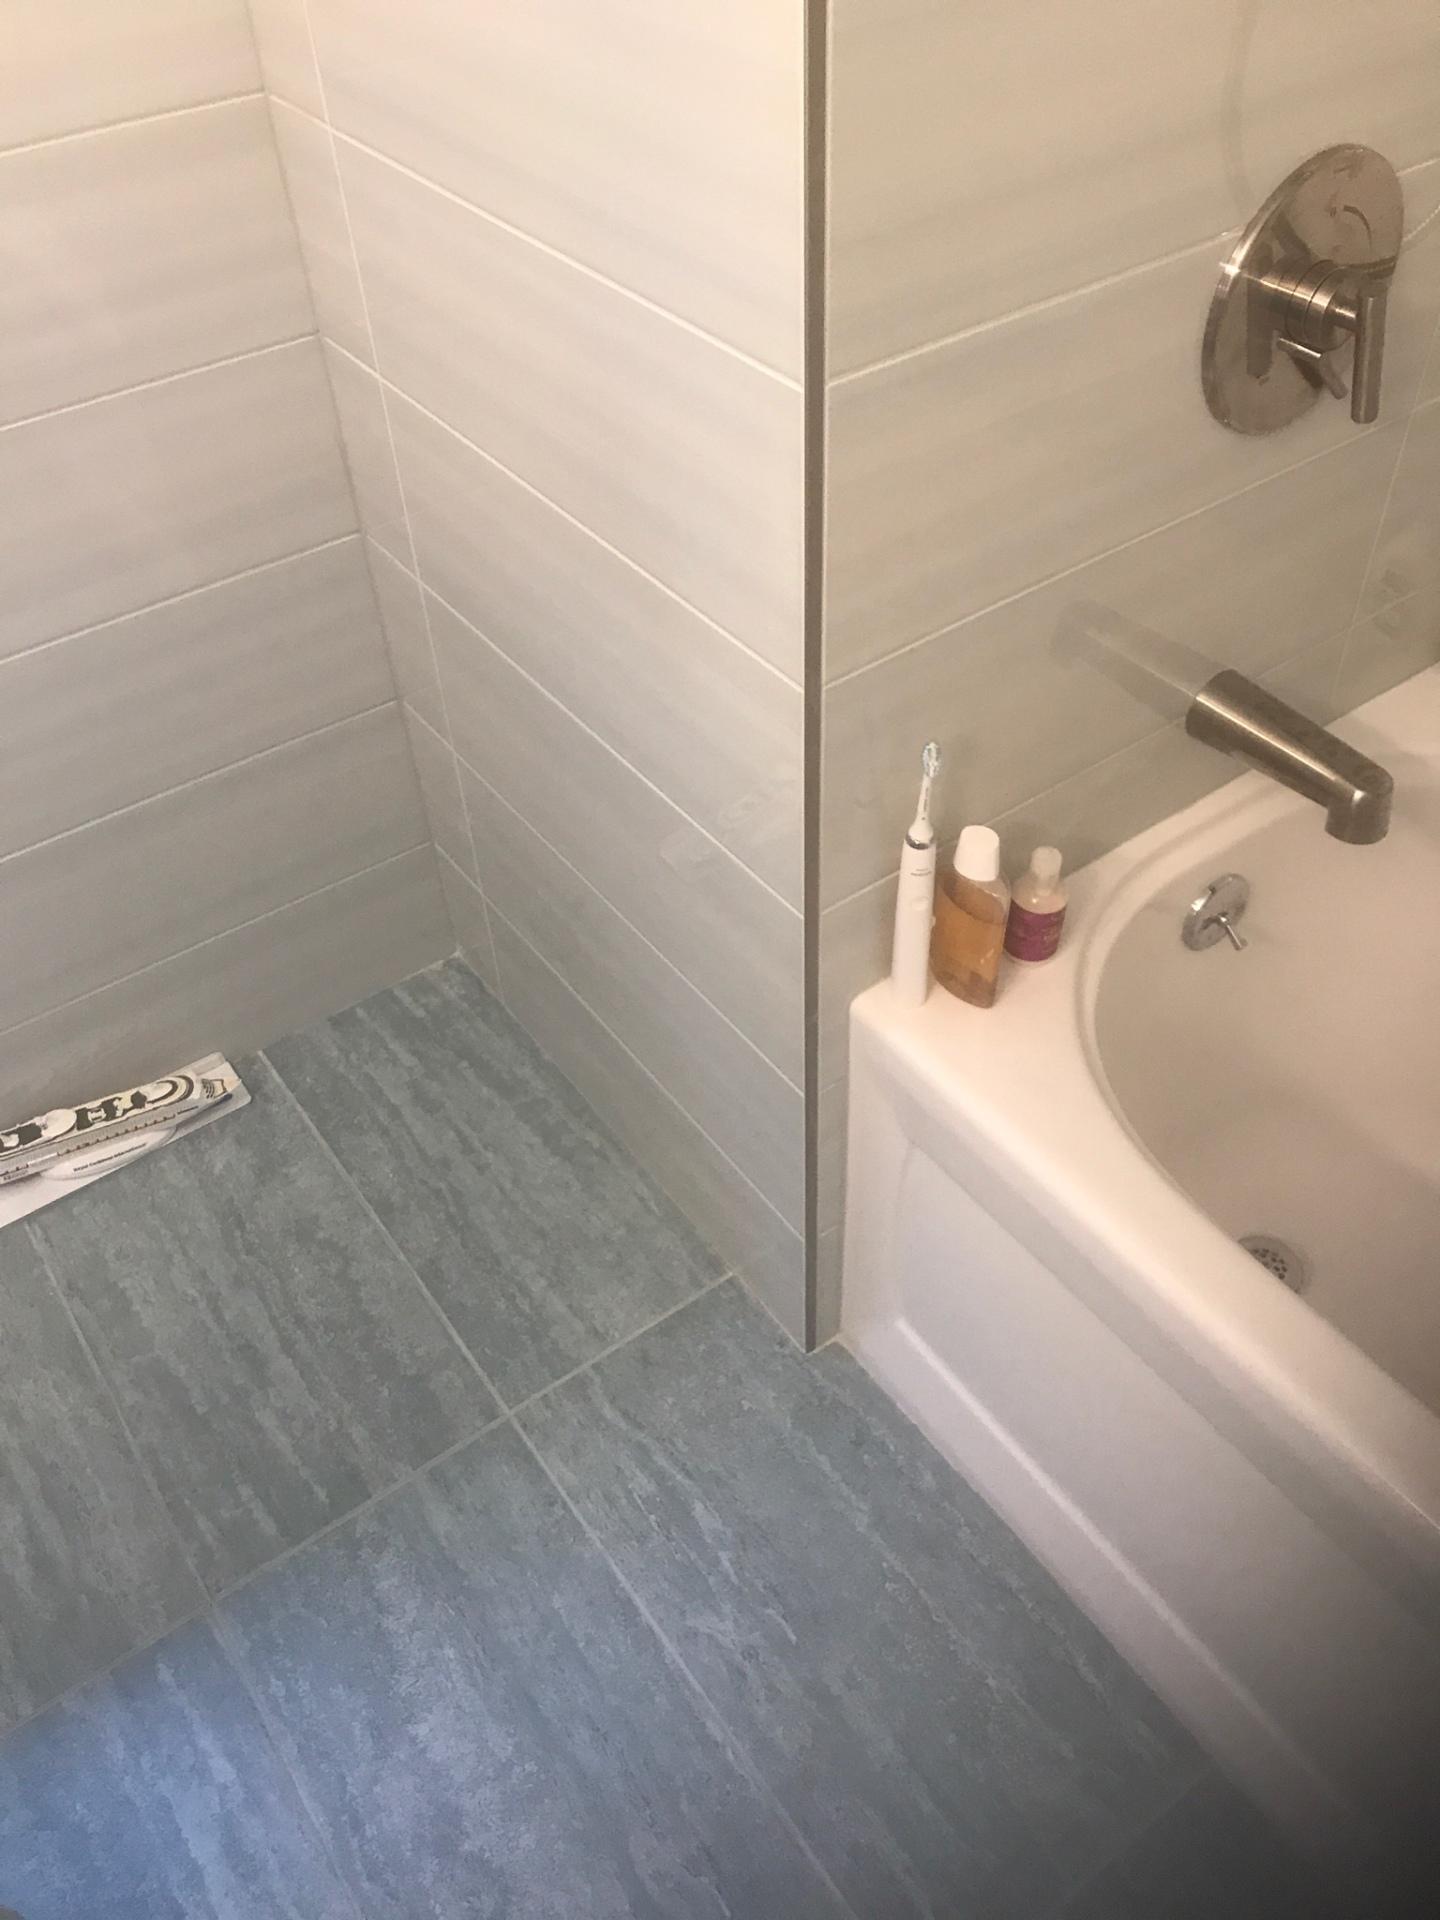 bathroom remodeling and bathroom renovation, replaced sink and bathroom vanity. replaced shower doors